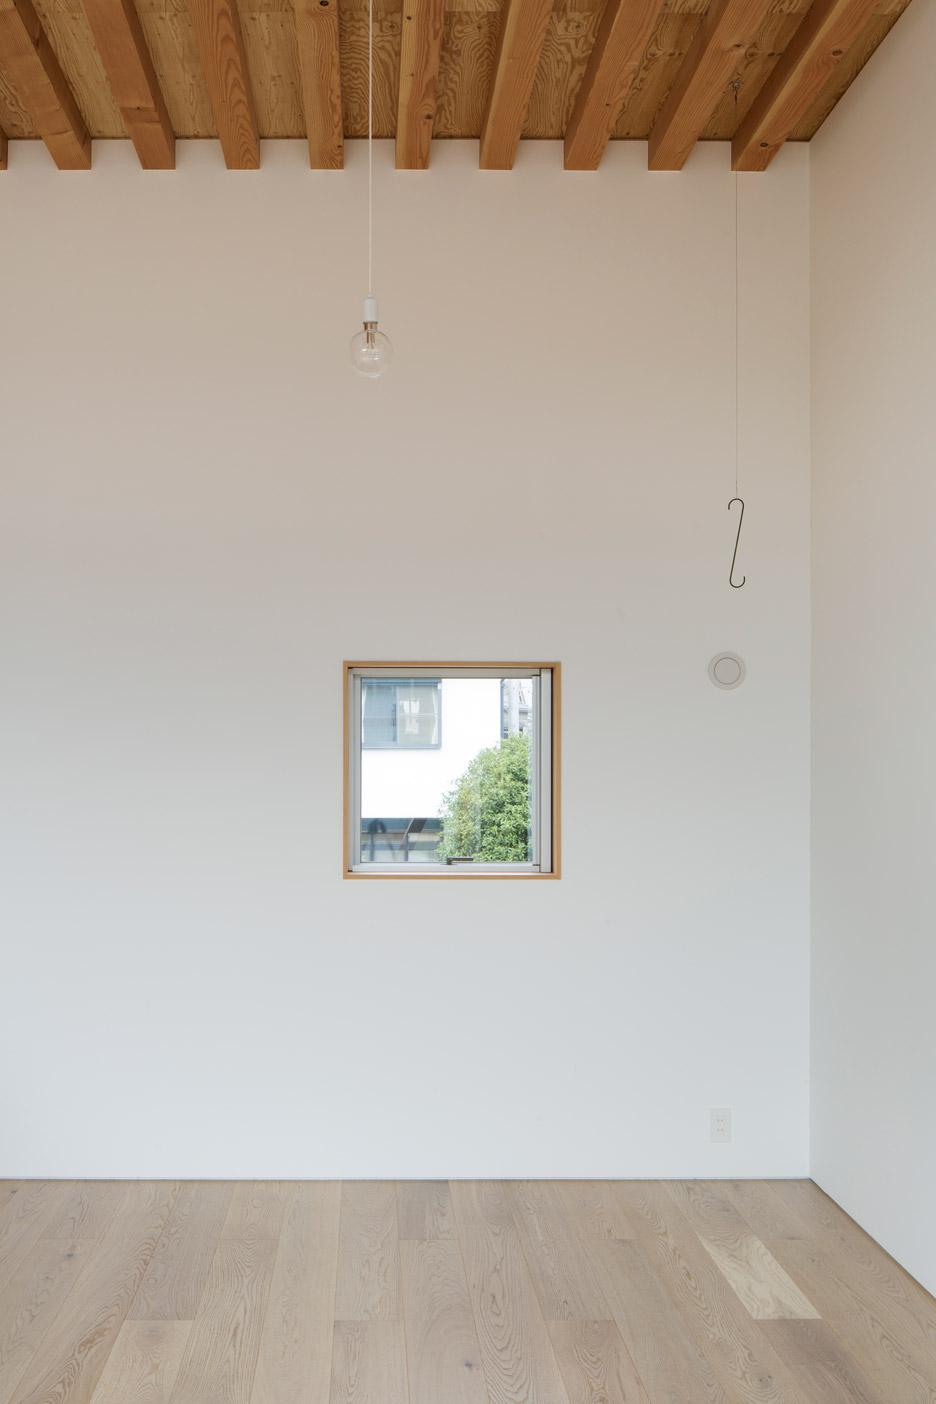 module-grid-house-tetsuo-yamaji-architects-kanto-japan_dezeen_936_6